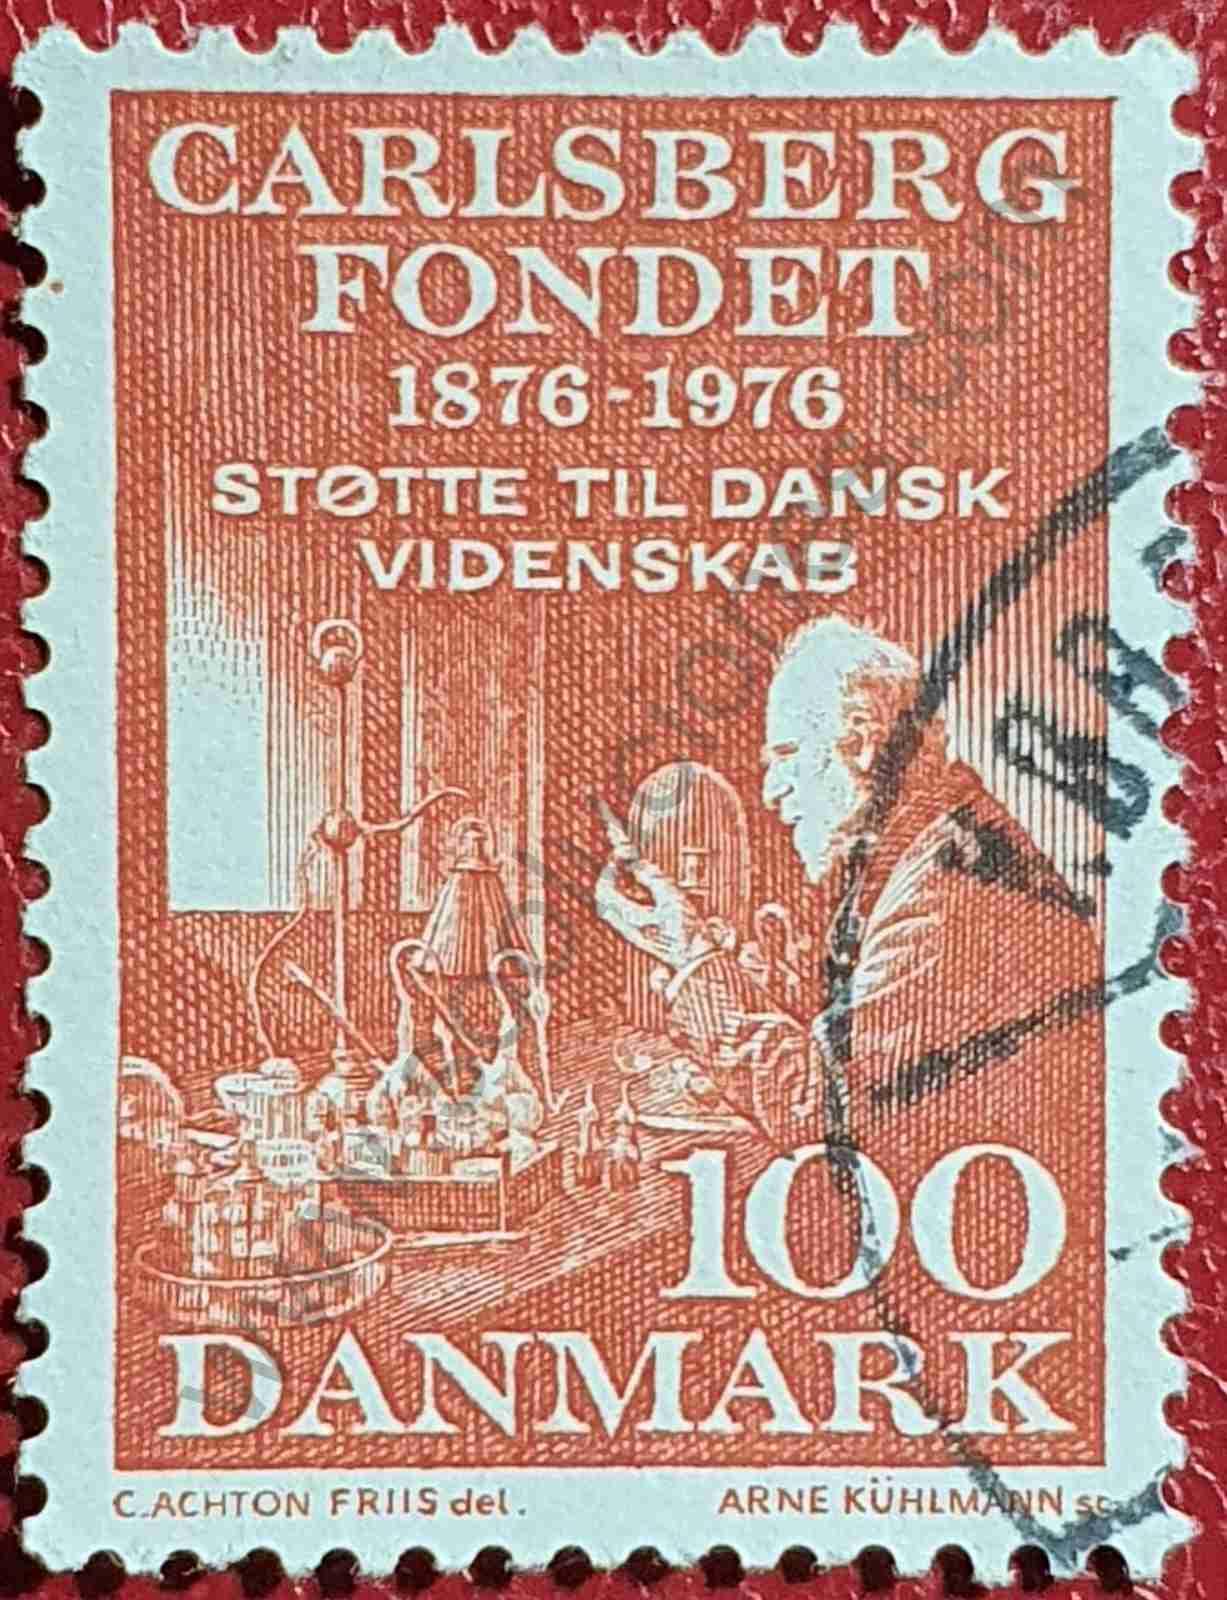 Emil Hansen - Sello de Dinamarca año 1976